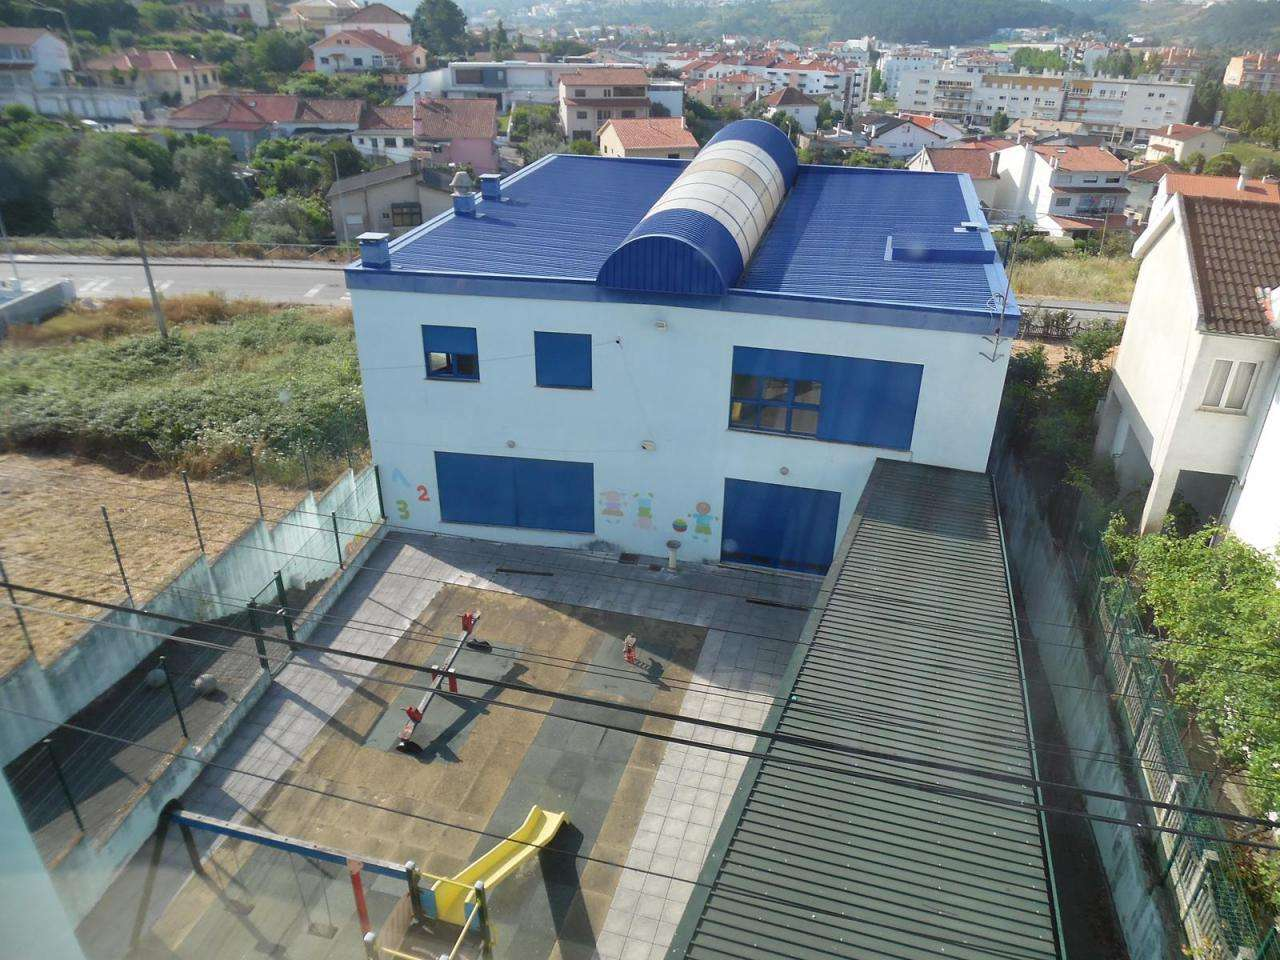 Prédio para comprar, Leiria, Pousos, Barreira e Cortes, Leiria - Foto 2